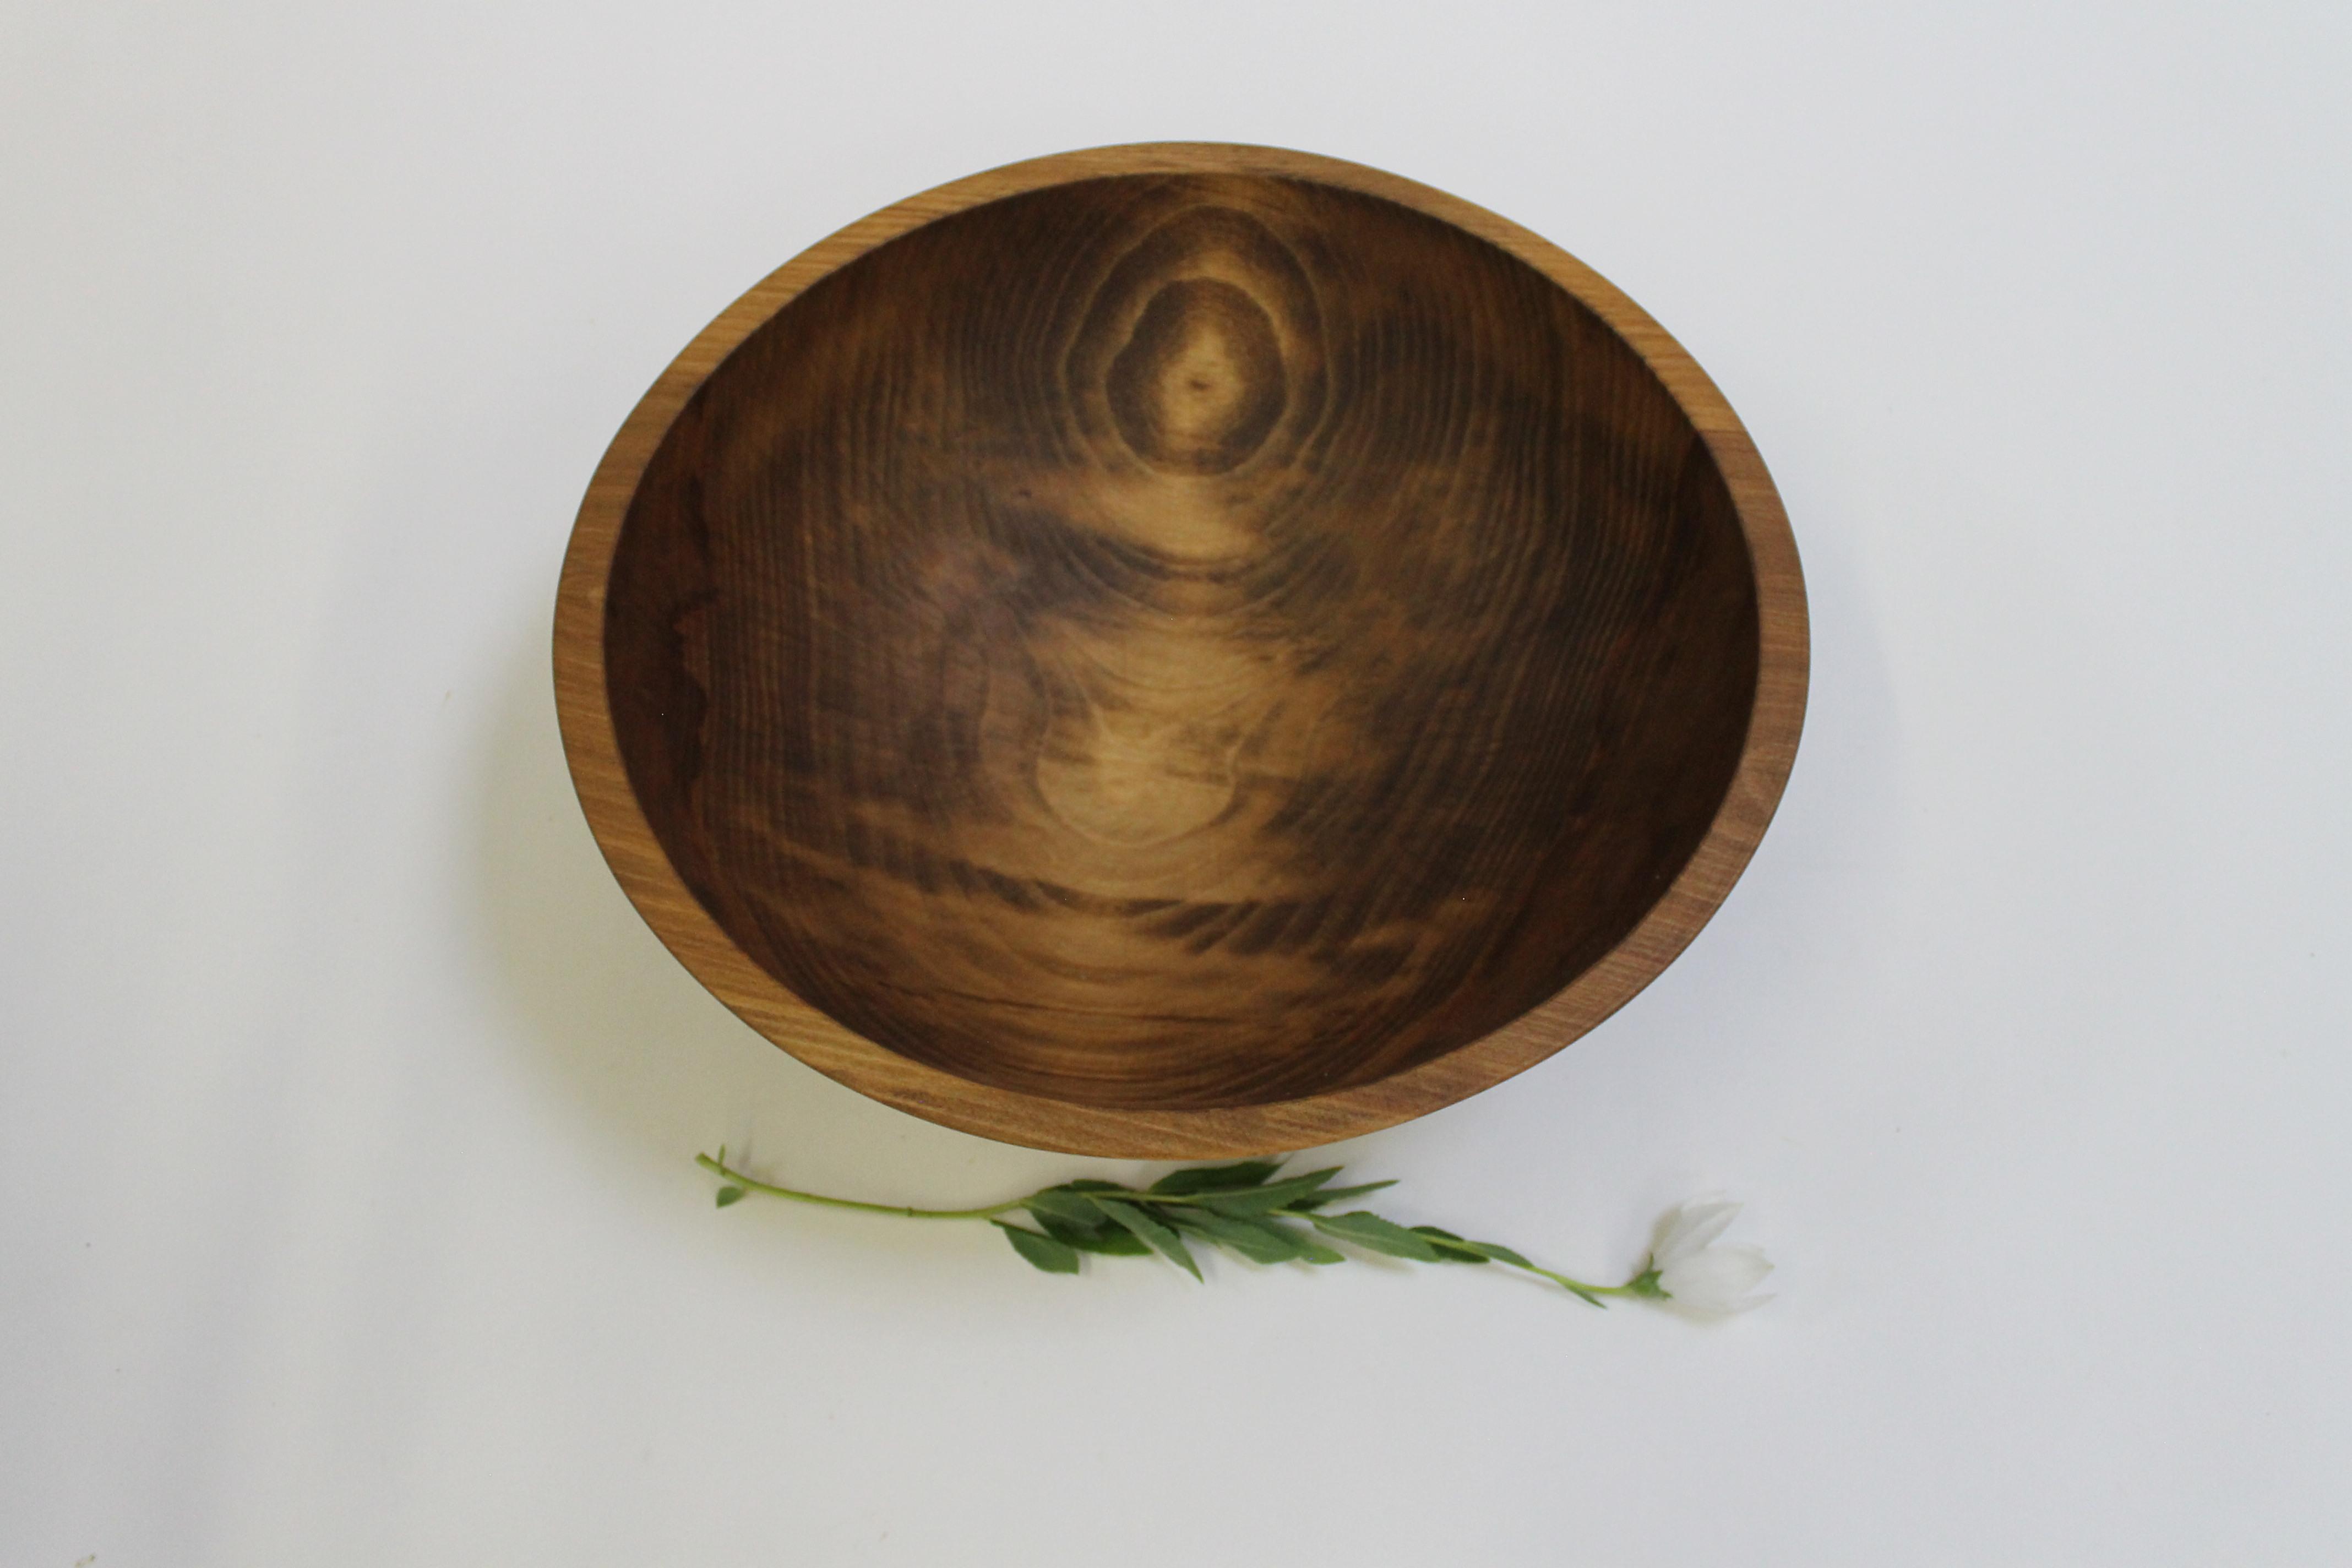 15 inch Beech Bowl - Dark Walnut & Bee's Oil Finish 115WBDK